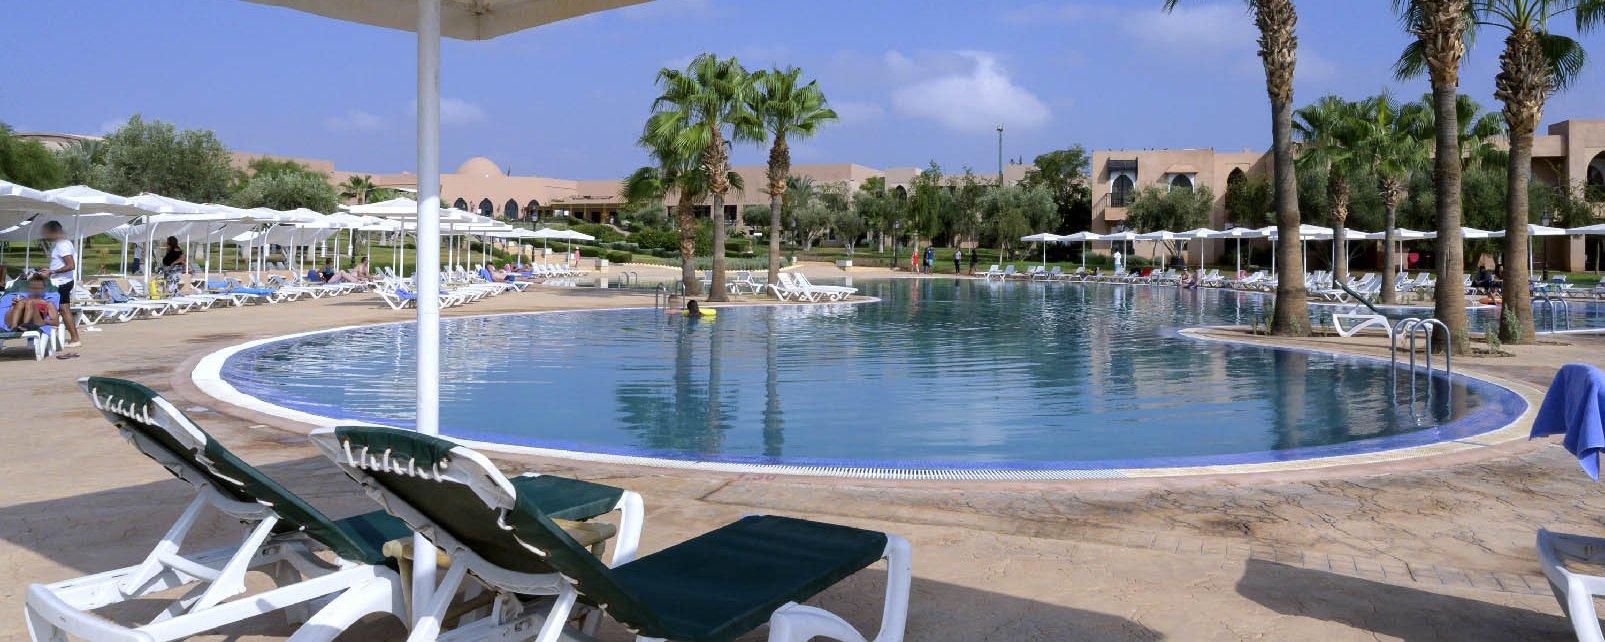 Hôtel Marrakech Ryads Parc and Spa